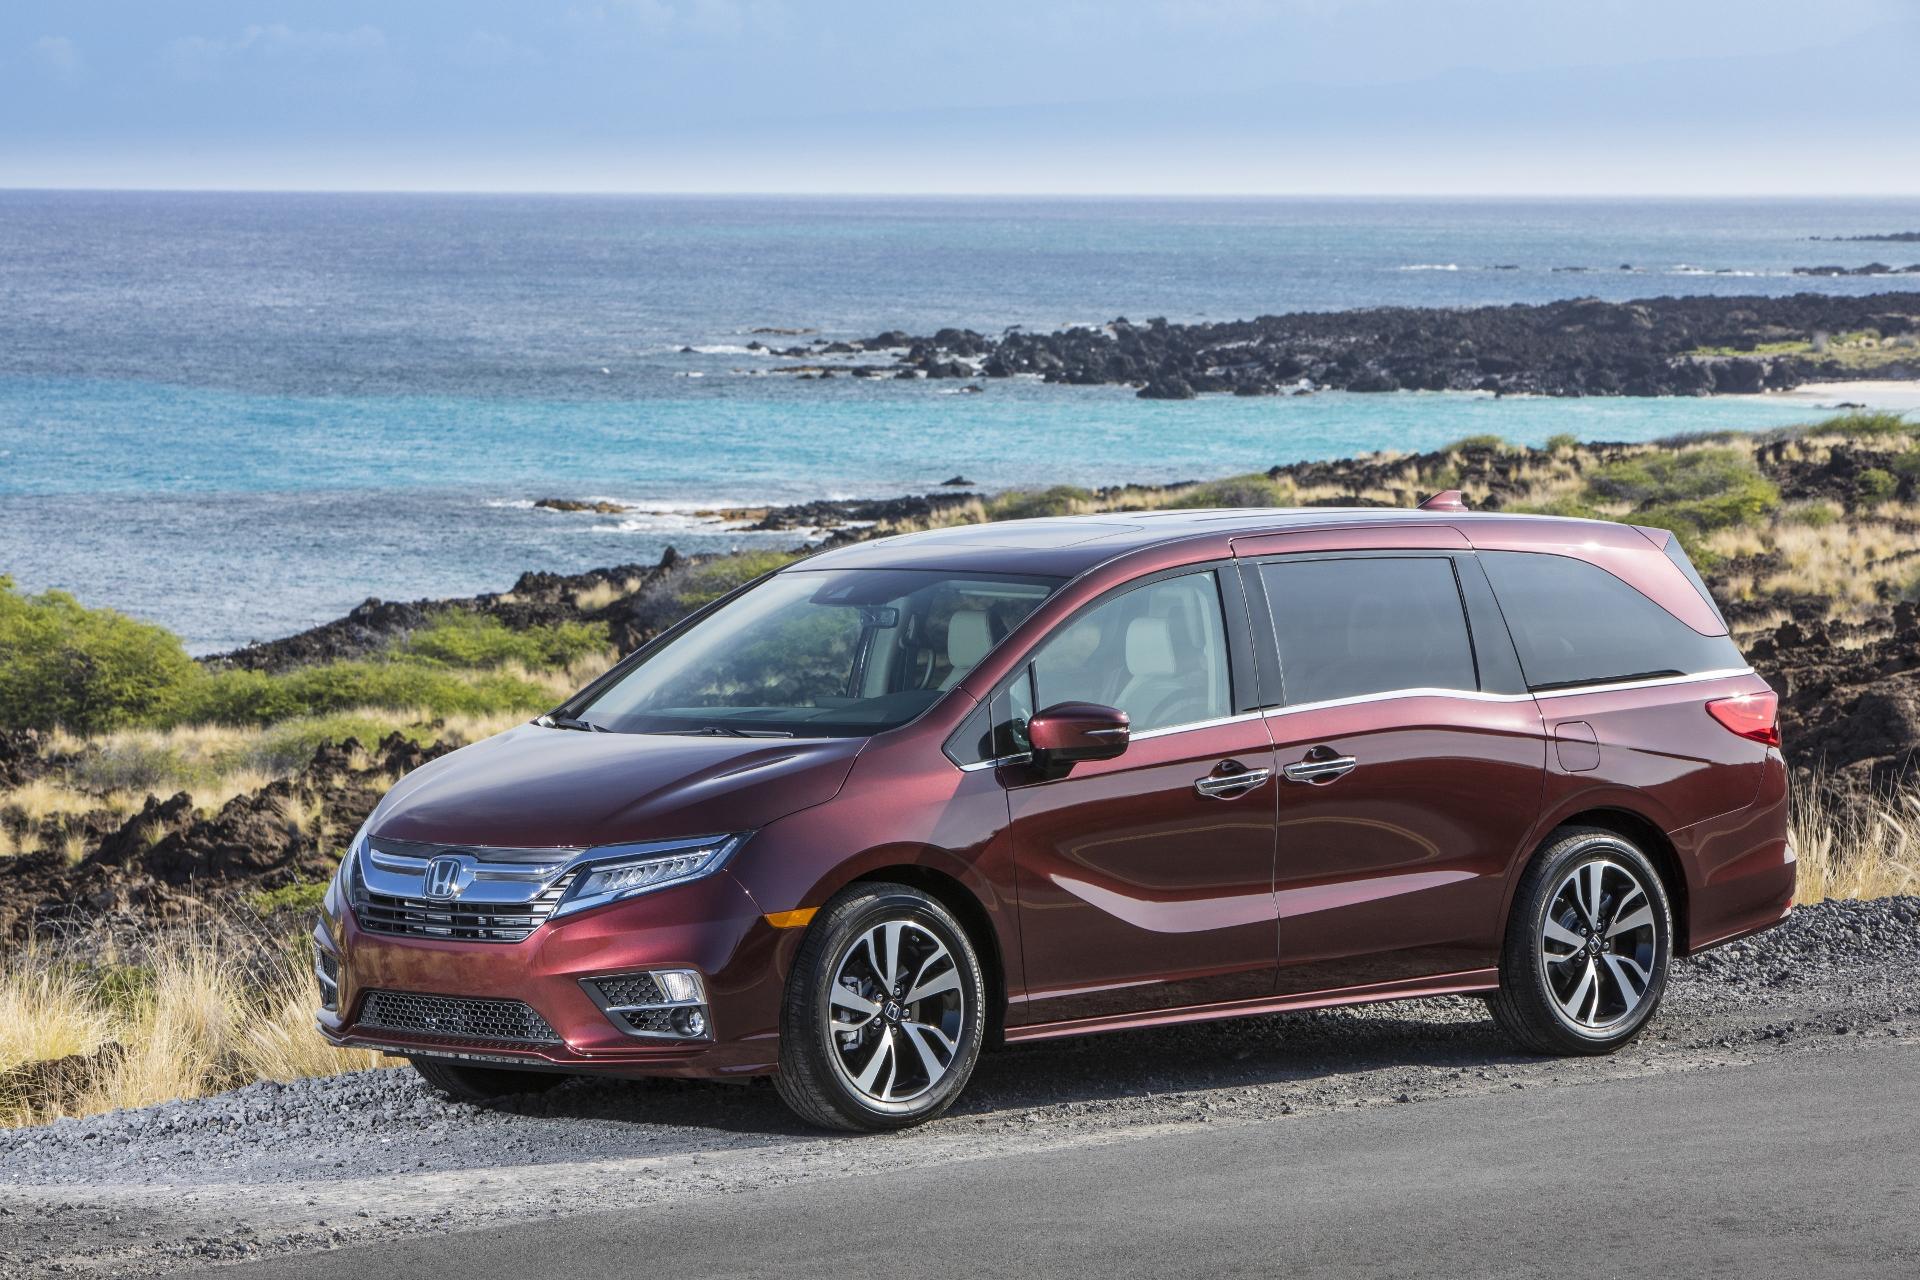 Honda Odyssey Wins 2018 CNET Roadshow Shift Cabin Tech of the Year Award